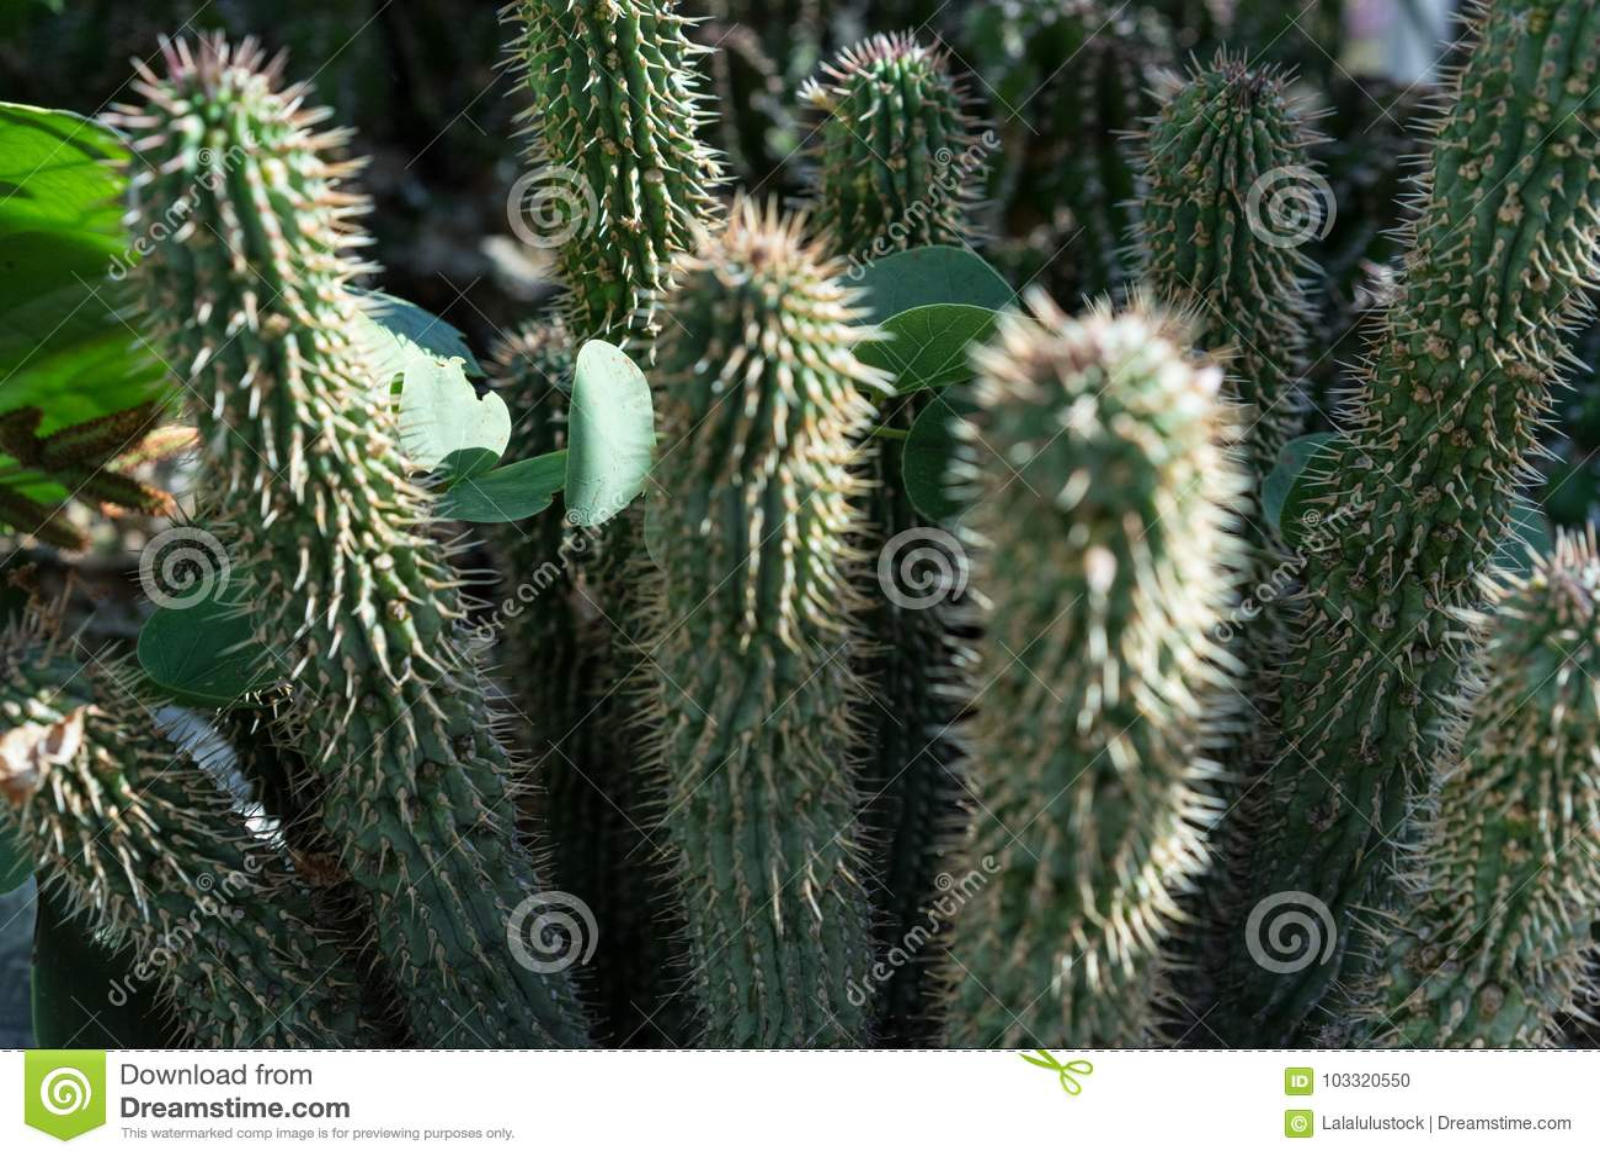 Hoodia Gordonii Cactus Plant Succulent Stock Photo Image Of